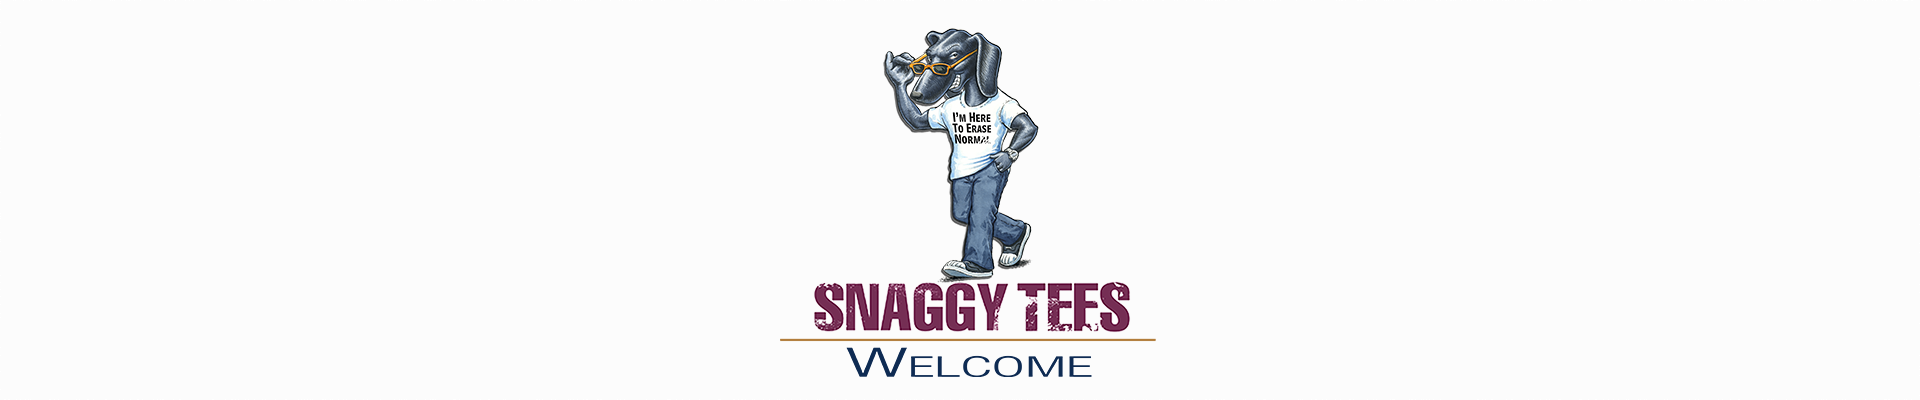 Snaggy Tees.com